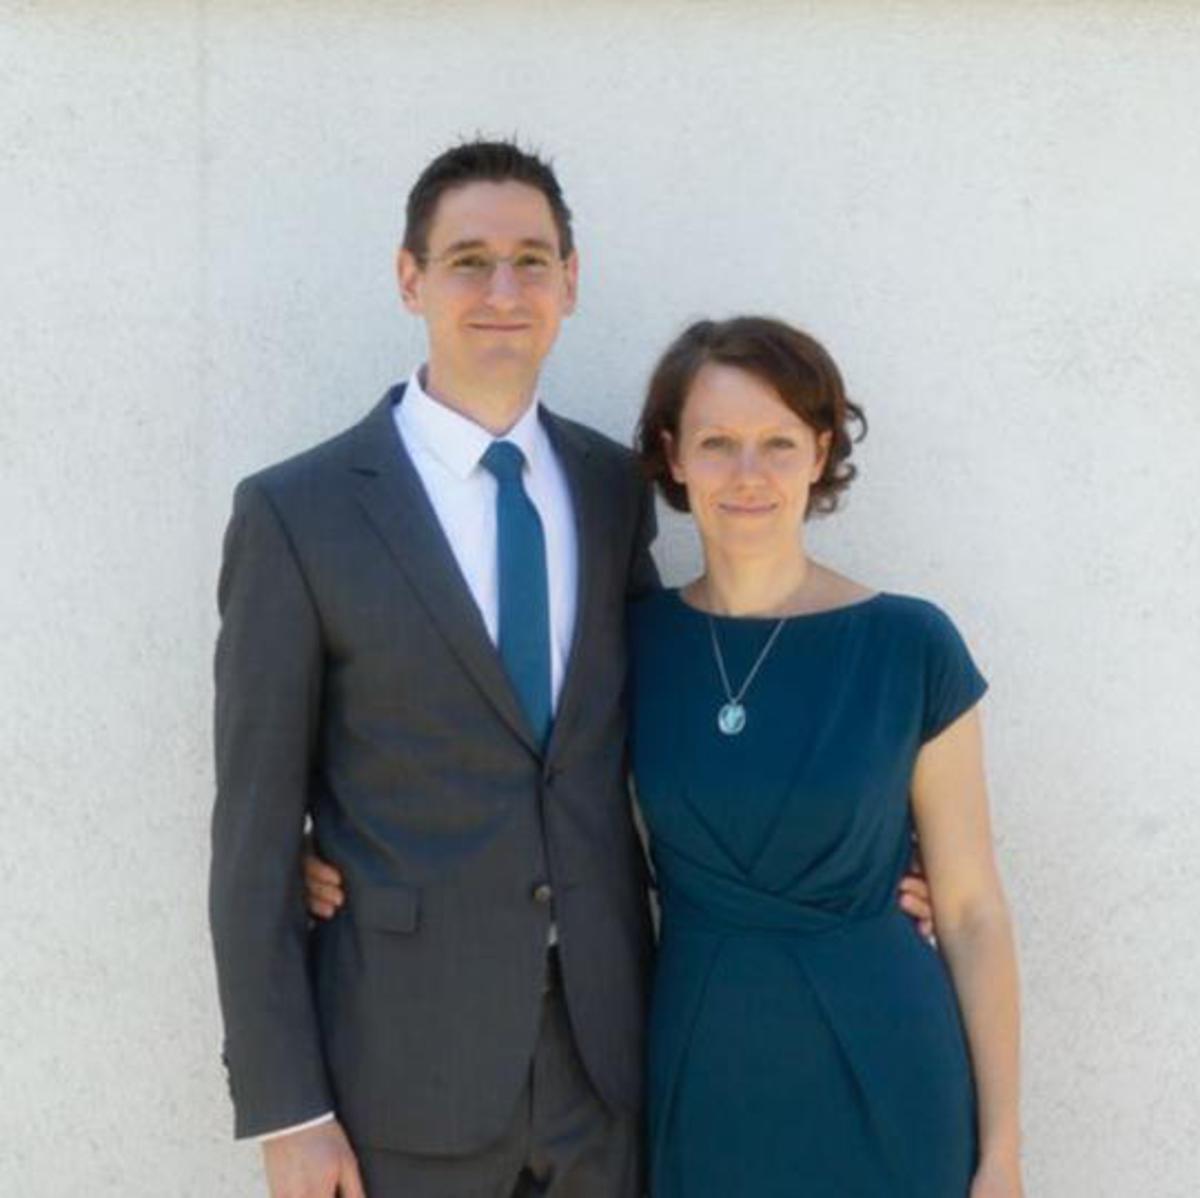 Simon und seine Frau Tamara Soucek